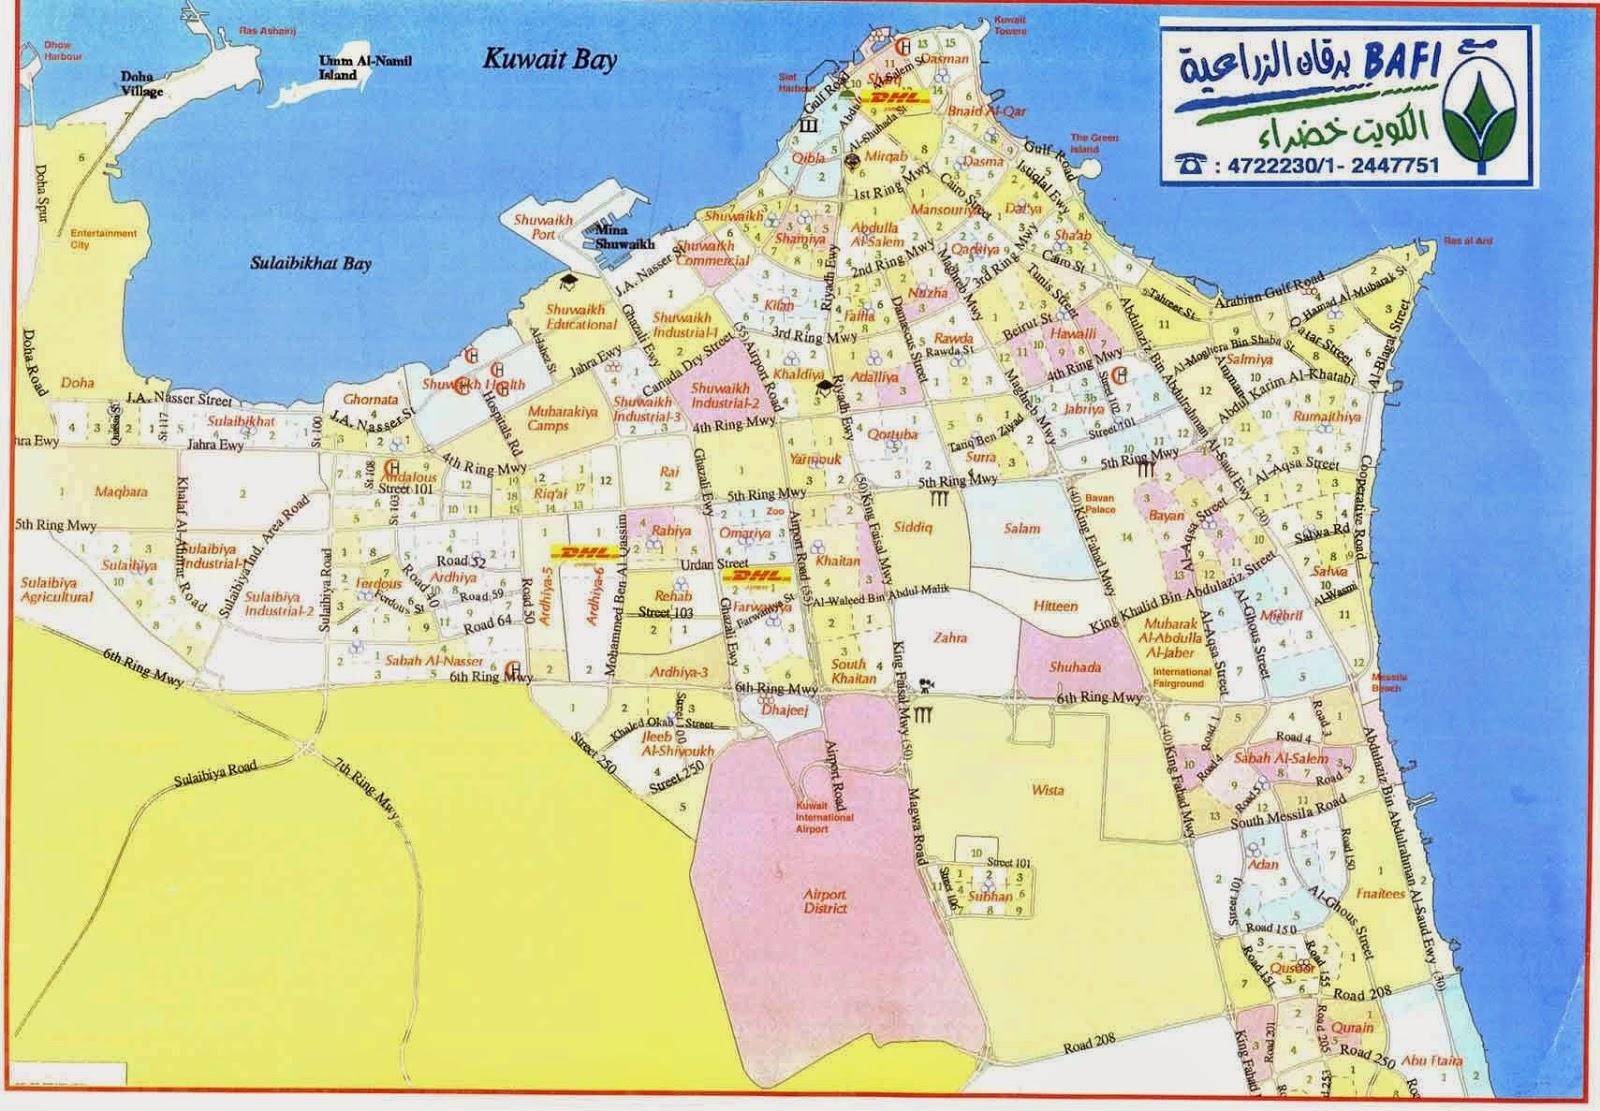 Kuwait City Street Maps and Metro Maps - Free Printable Maps on sudan area map, kowloon area map, bahrain area map, syrian area map, ghana area map, tahiti area map, mosul area map, kashmir area map, jordan area map, north america area map, gaza strip area map, tunisia area map, doha area map, kurdistan area map, madagascar area map, haiti area map, new zealand area map, south pole area map, kuala lumpur area map, uzbekistan area map,